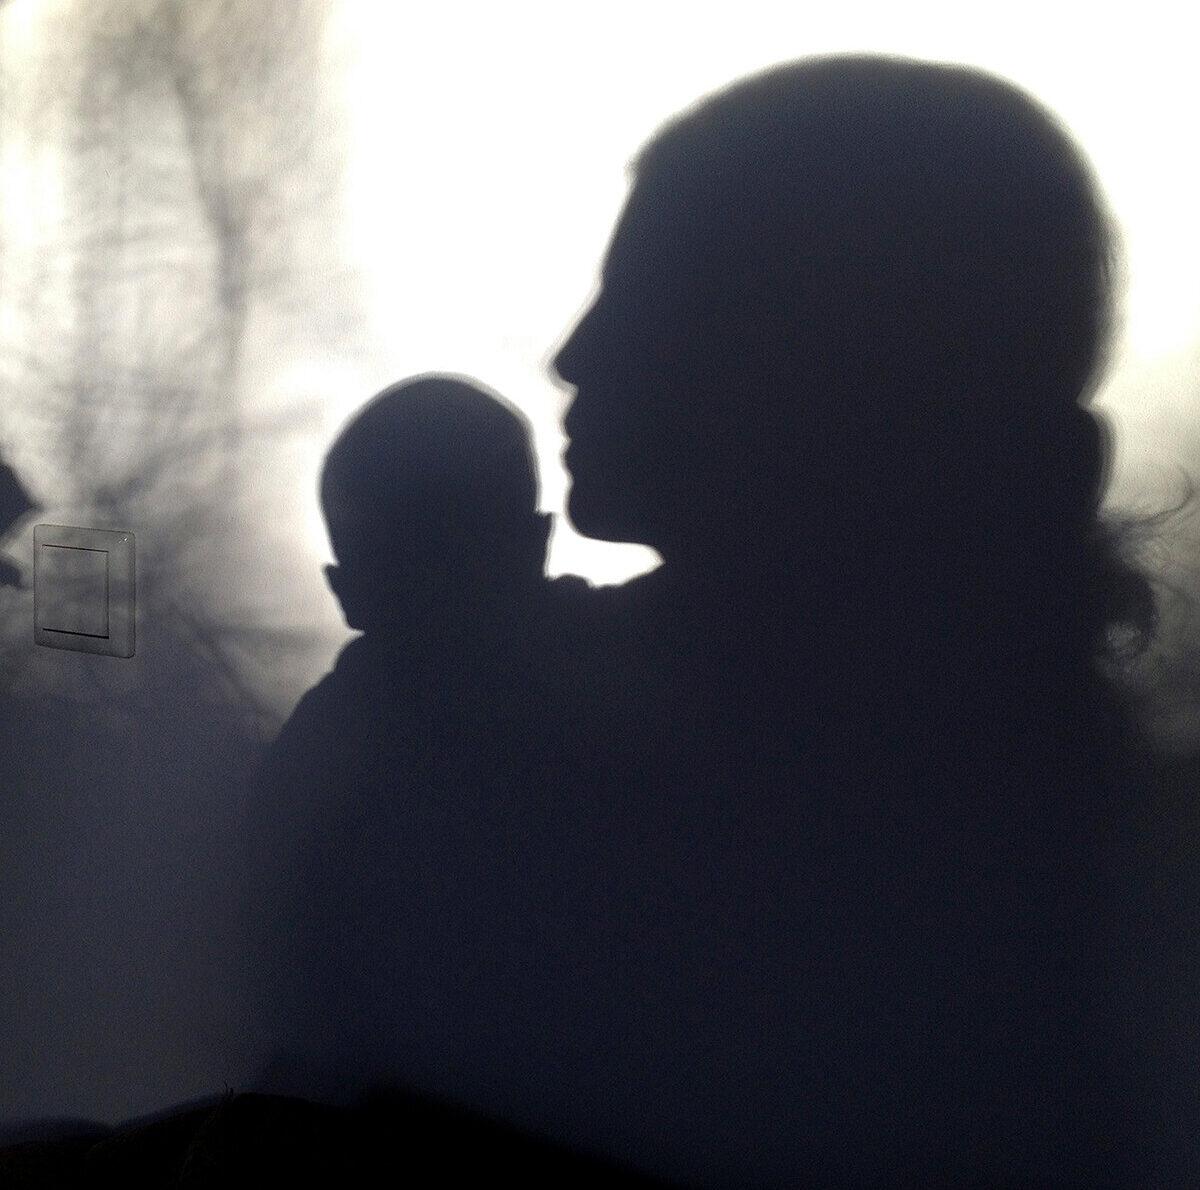 samotność mamy w pandemii